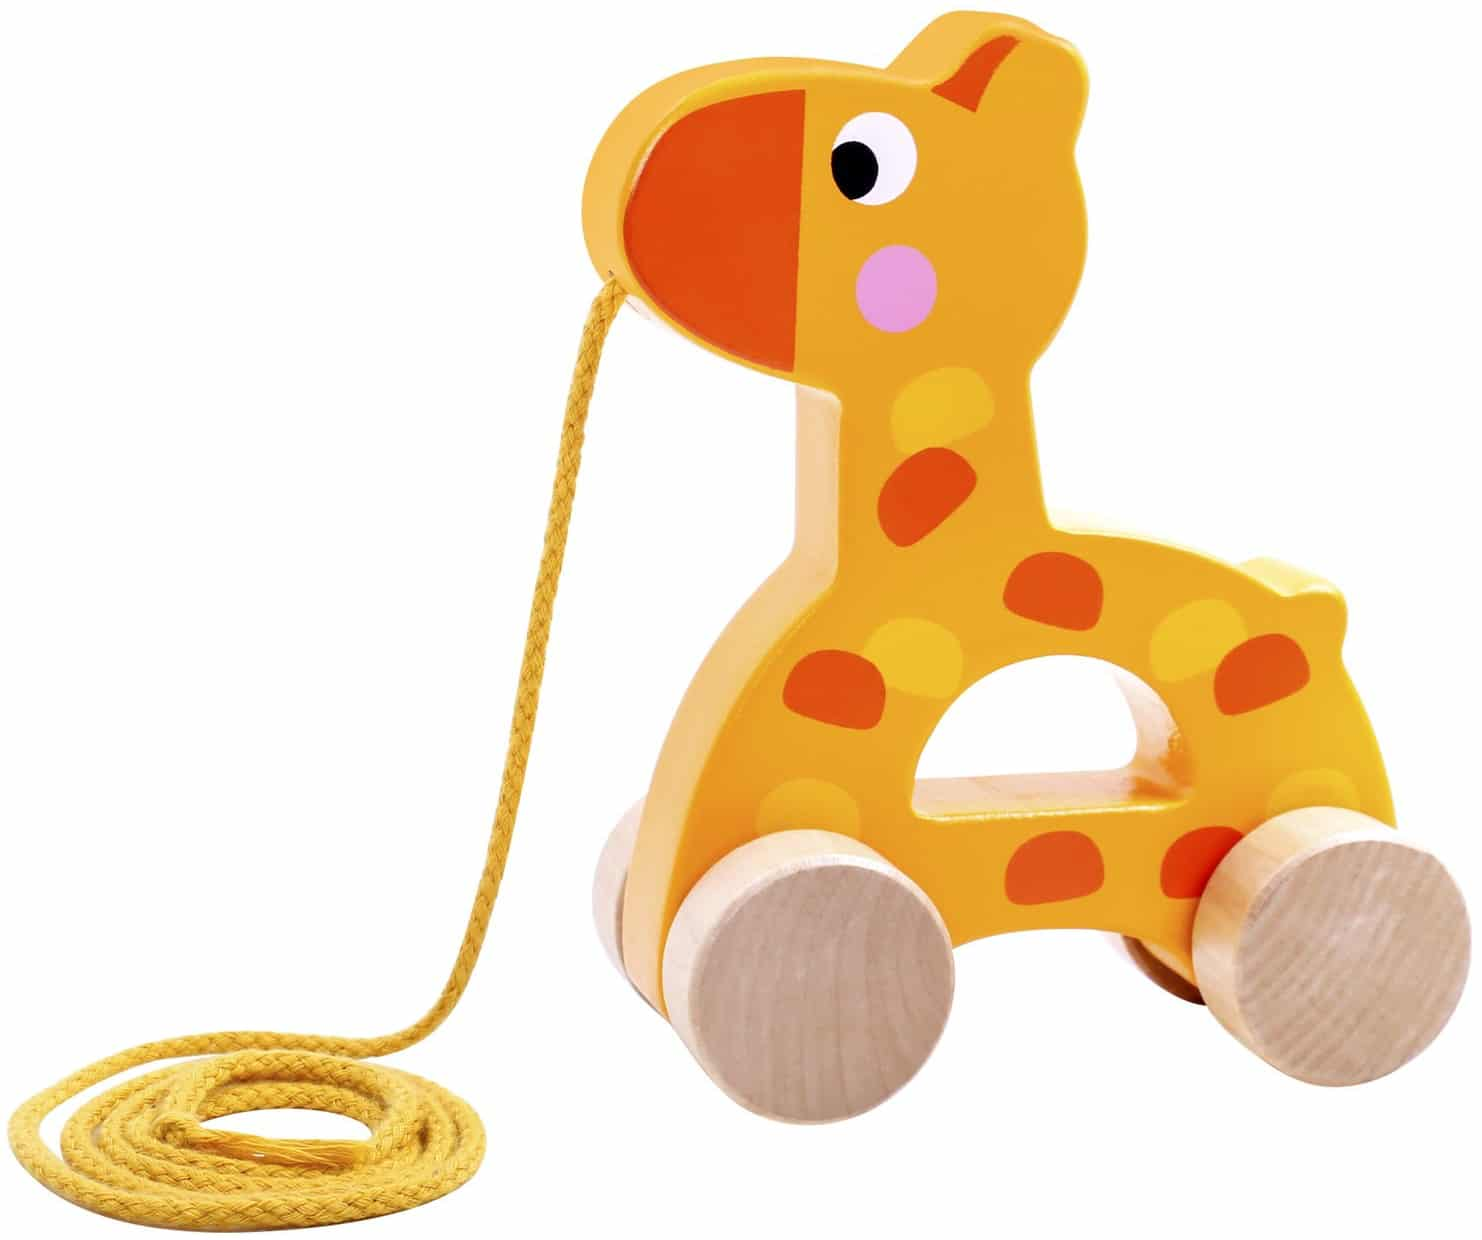 Push / Pull toys